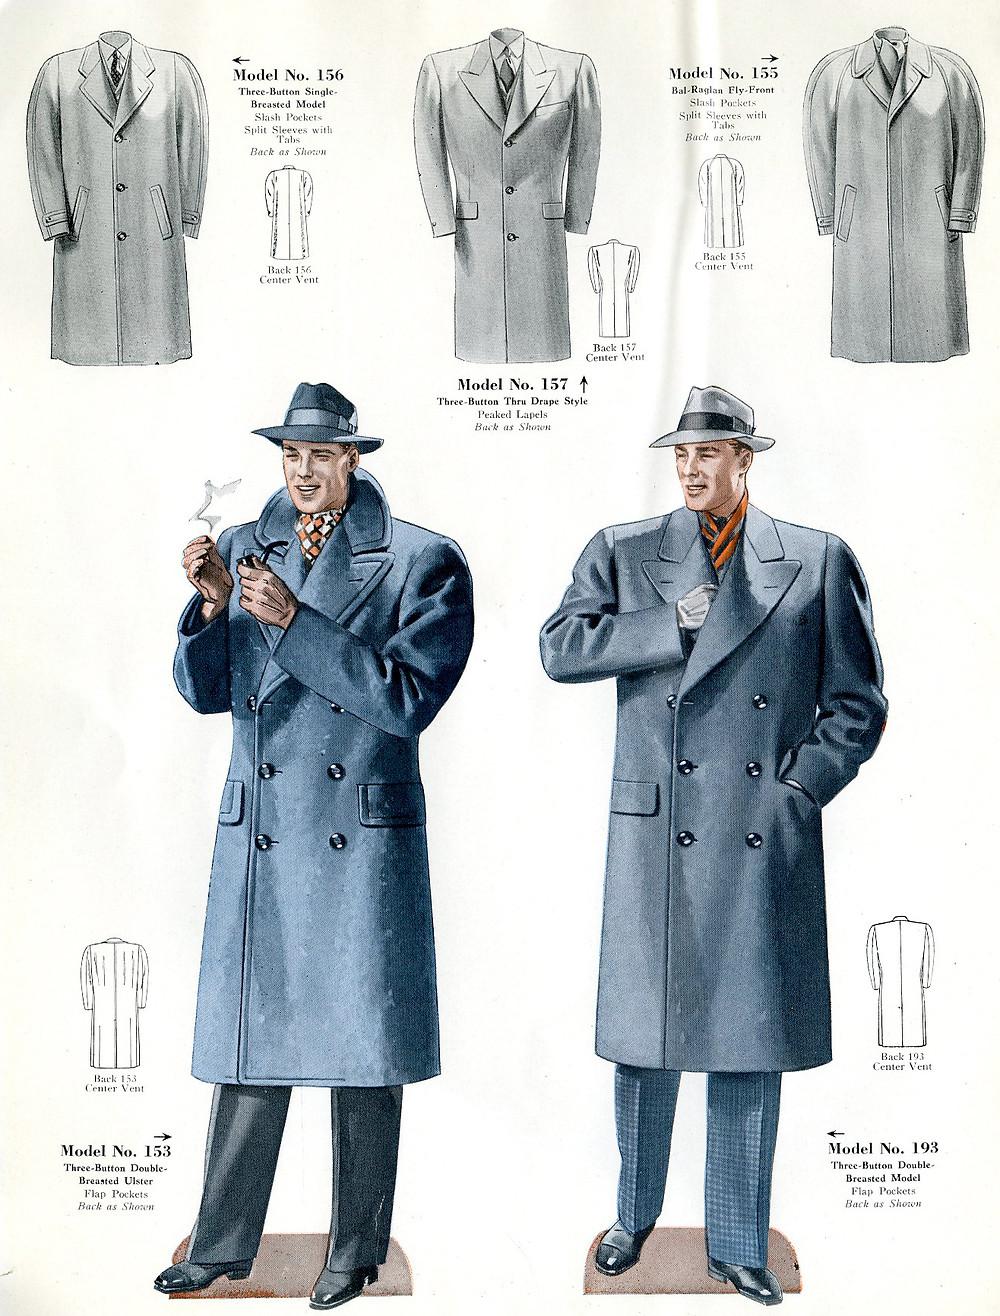 1940s fashion overcoats for men